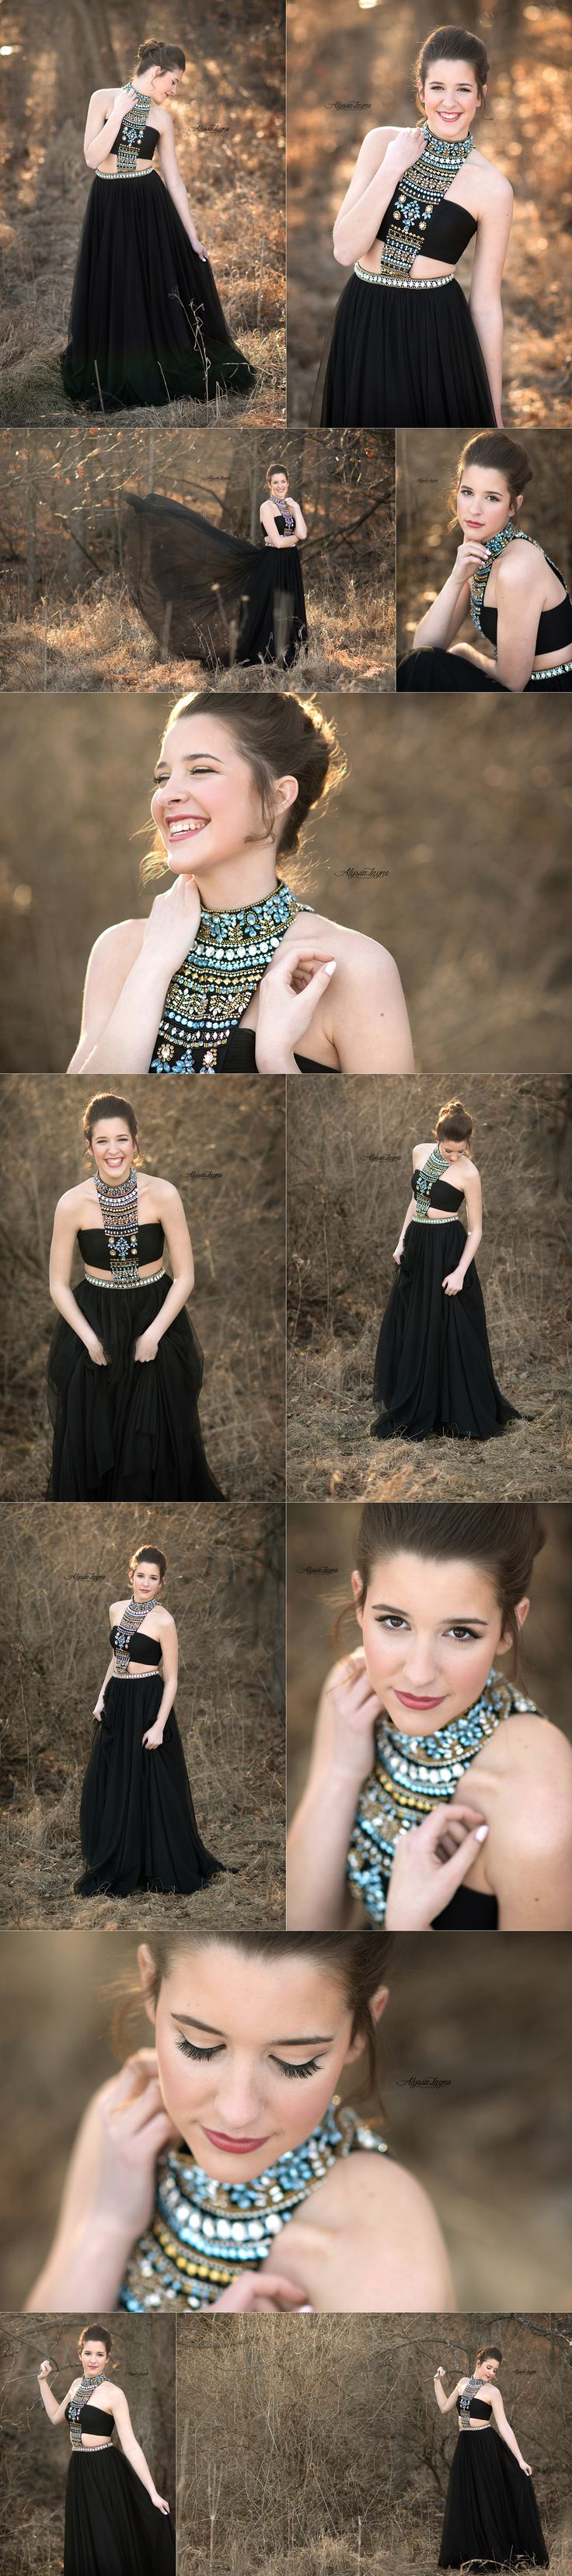 Senior Pictures | Alyssa Layne Photography | Prom Dress | Senior Pose | Posing | Class of 2016 | Illinois Photographer